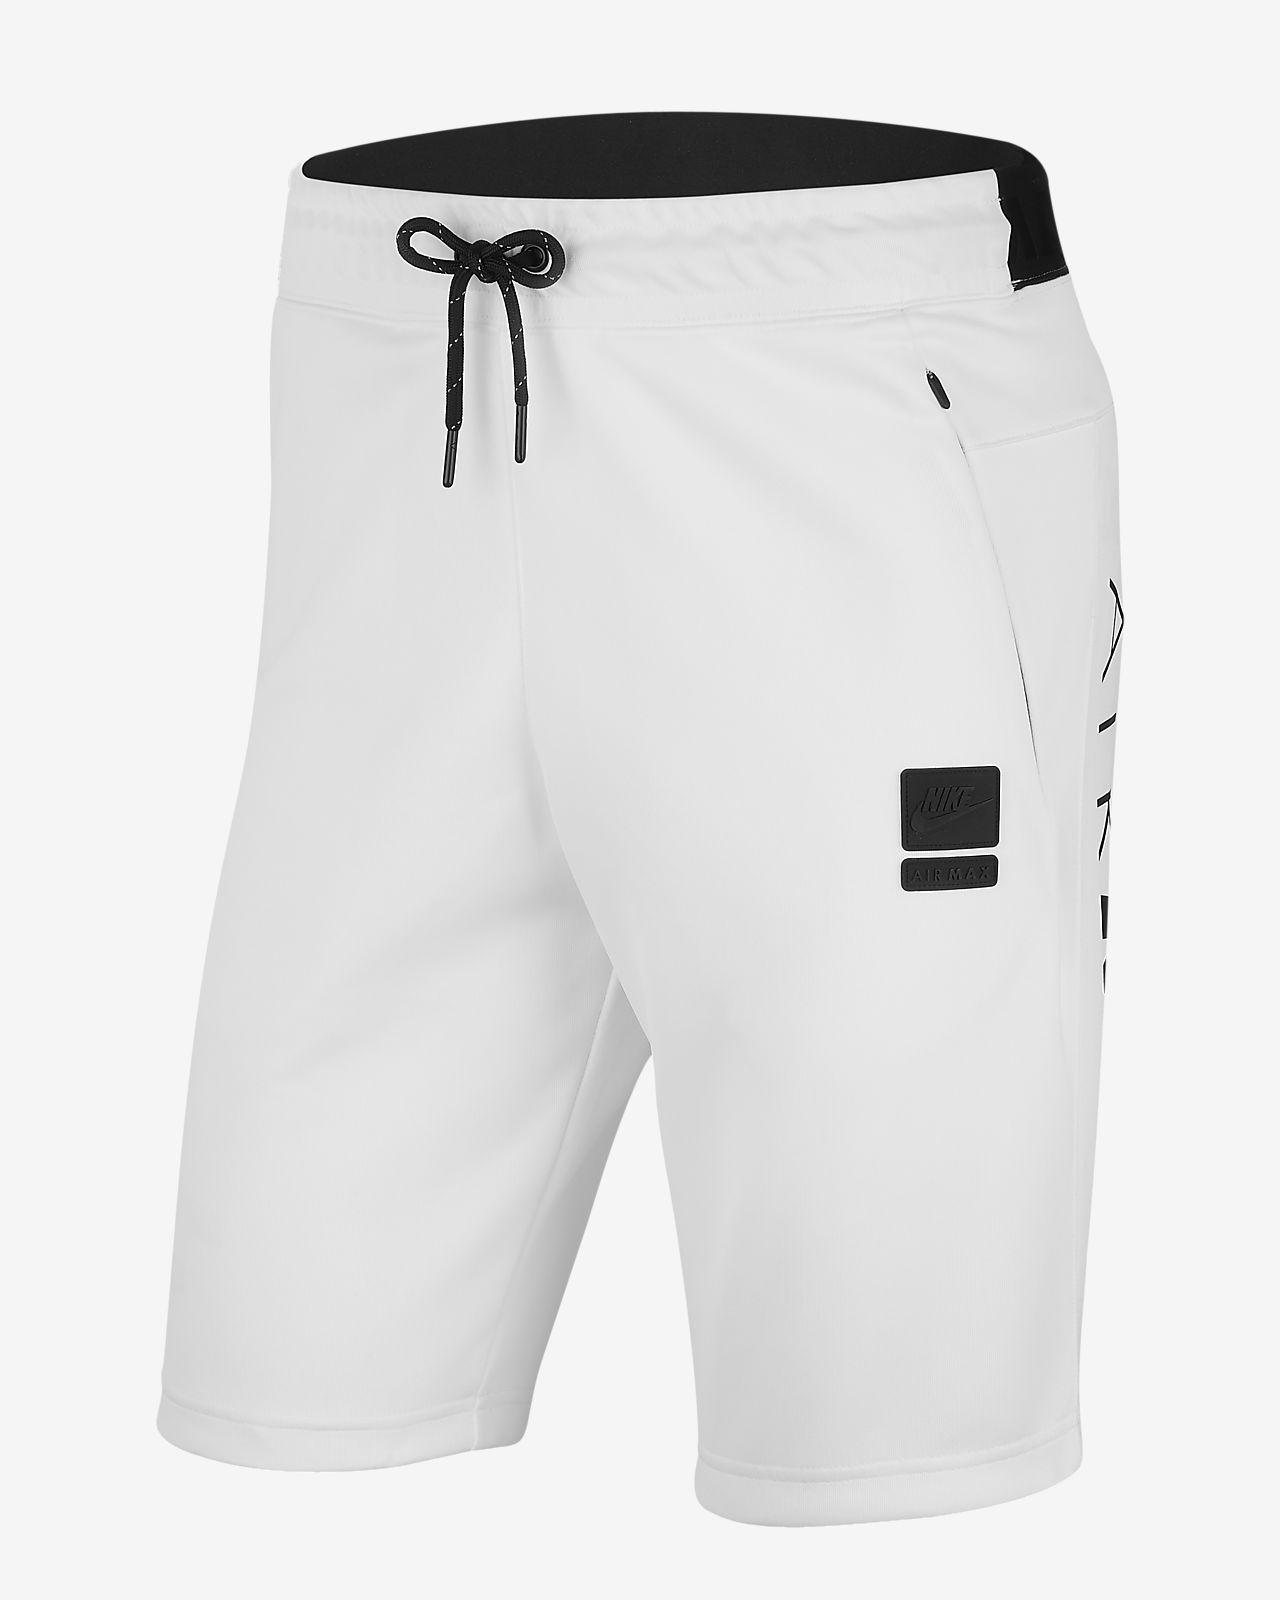 hot sale online d4821 242c4 ... Shorts Nike Sportswear för män